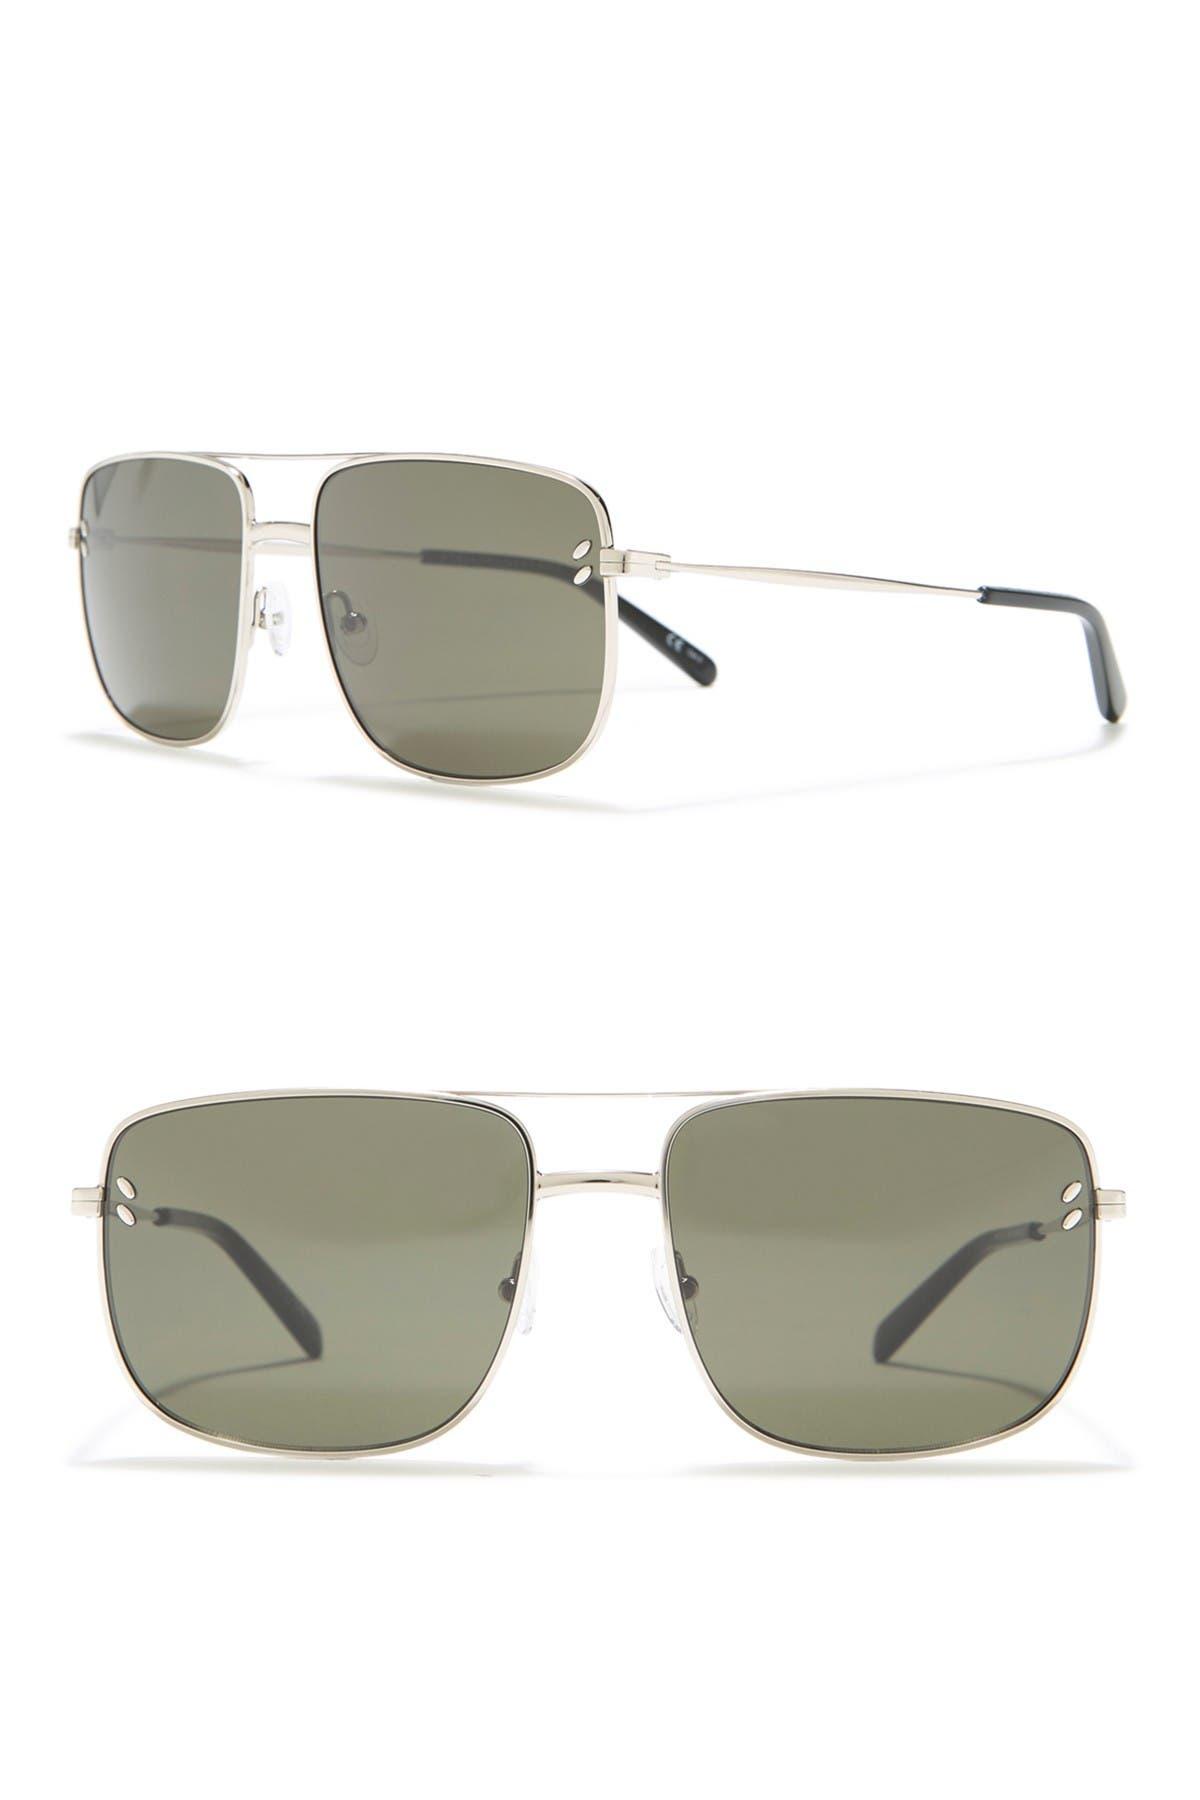 Image of Stella McCartney 58mm Navigator Sunglasses